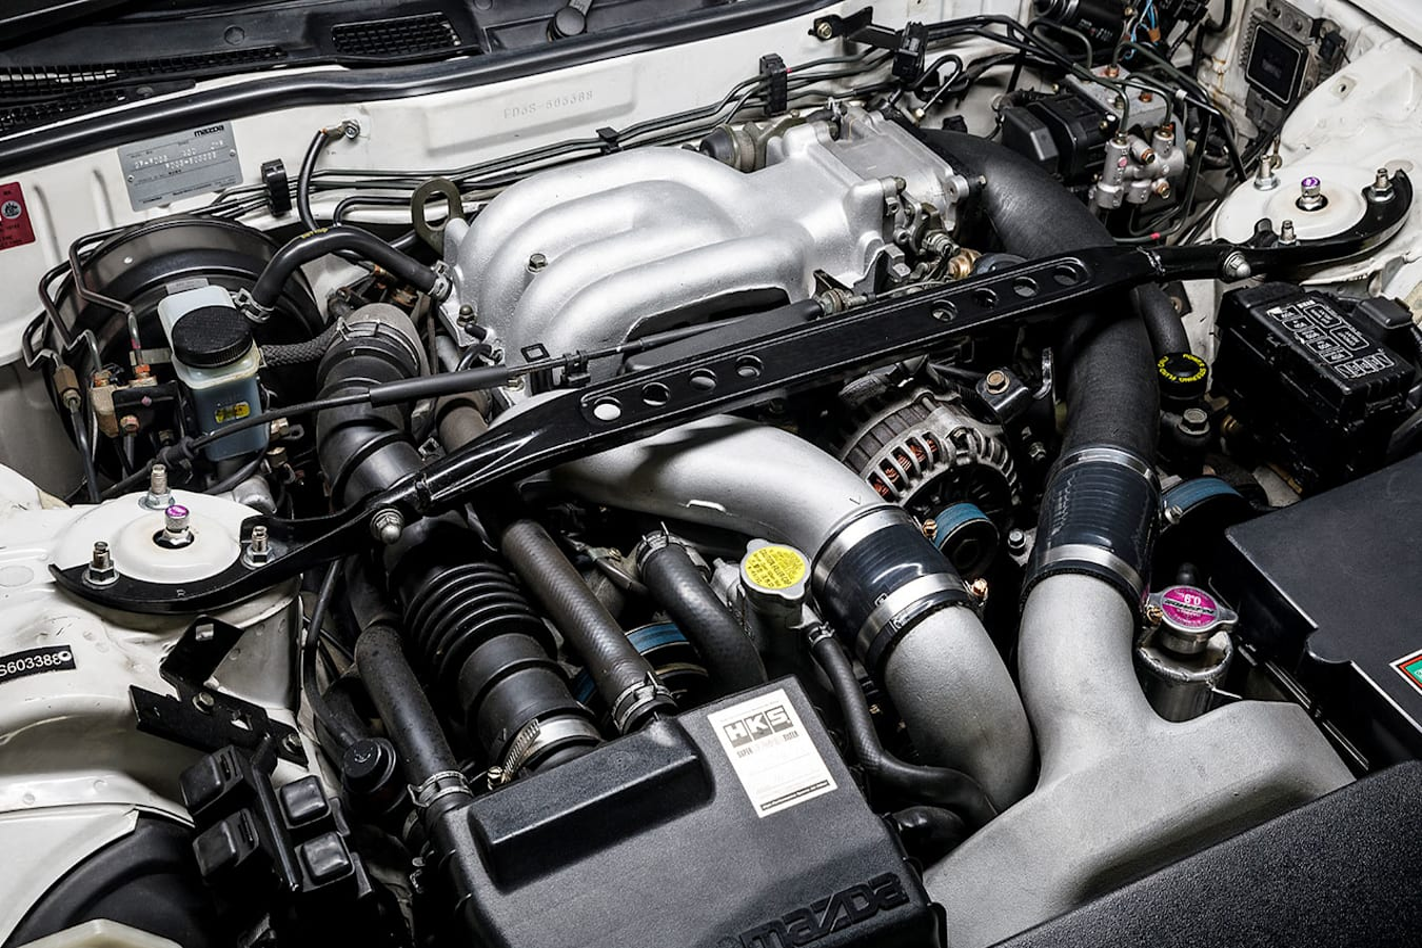 Mazda RX-7 engine